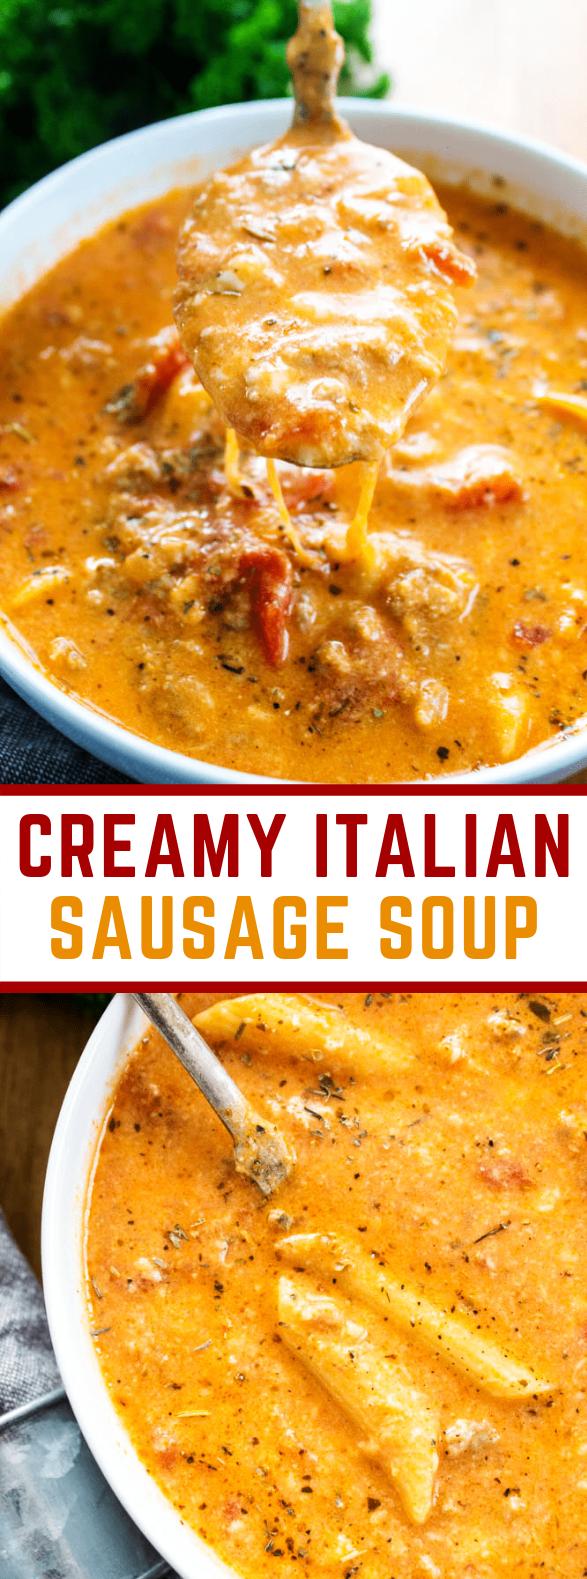 CREAMY ITALIAN SAUSAGE SOUP #dinner #familydinner